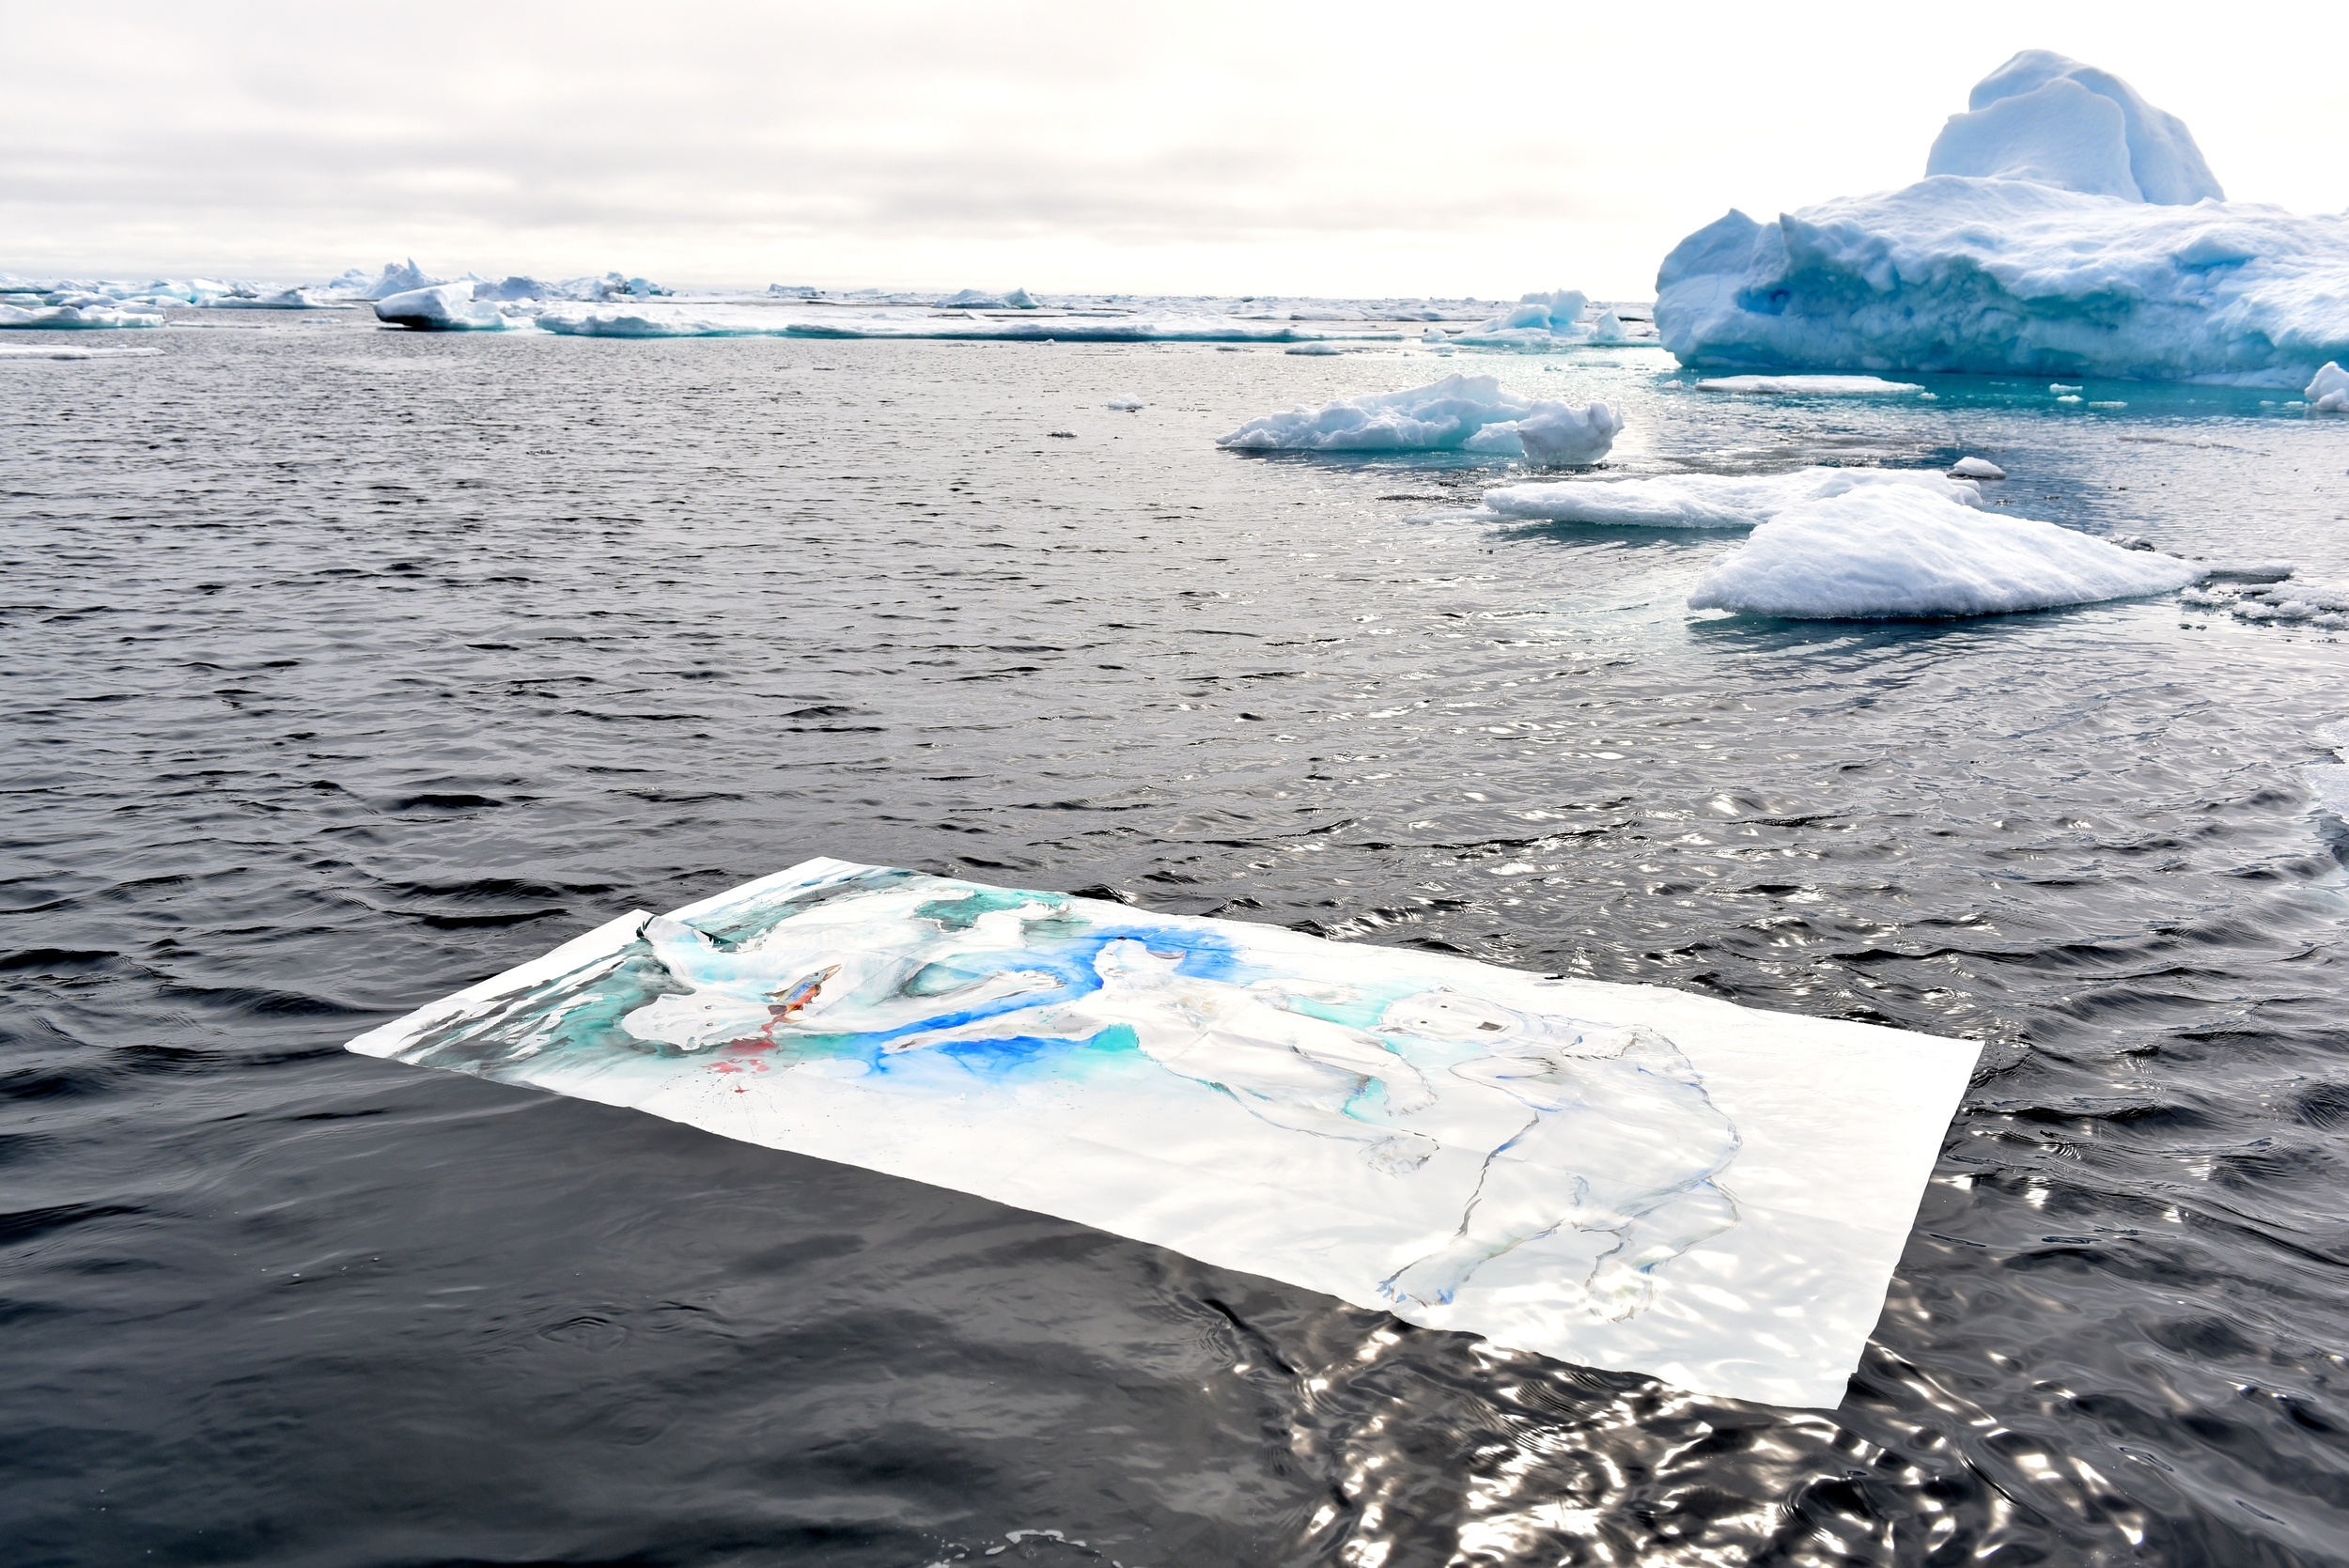 DFiedler-MPolk_PolarBearFloatingArt1_Greenland2015.JPG